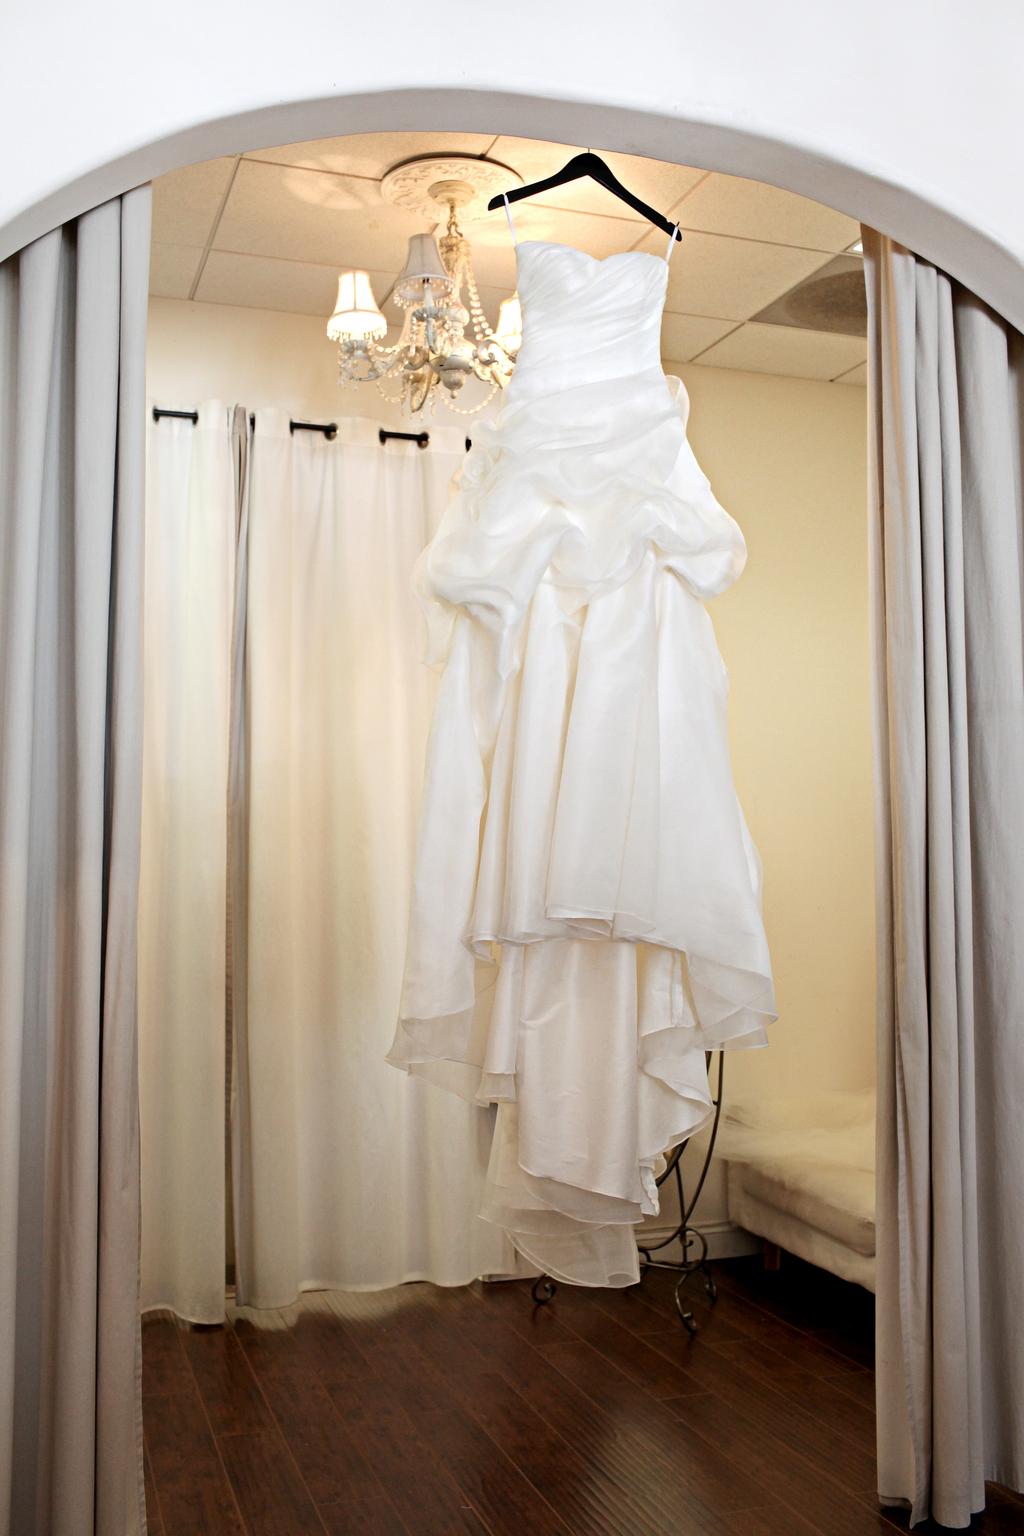 Brides-wedding-dress-hangs-in-doorway.full